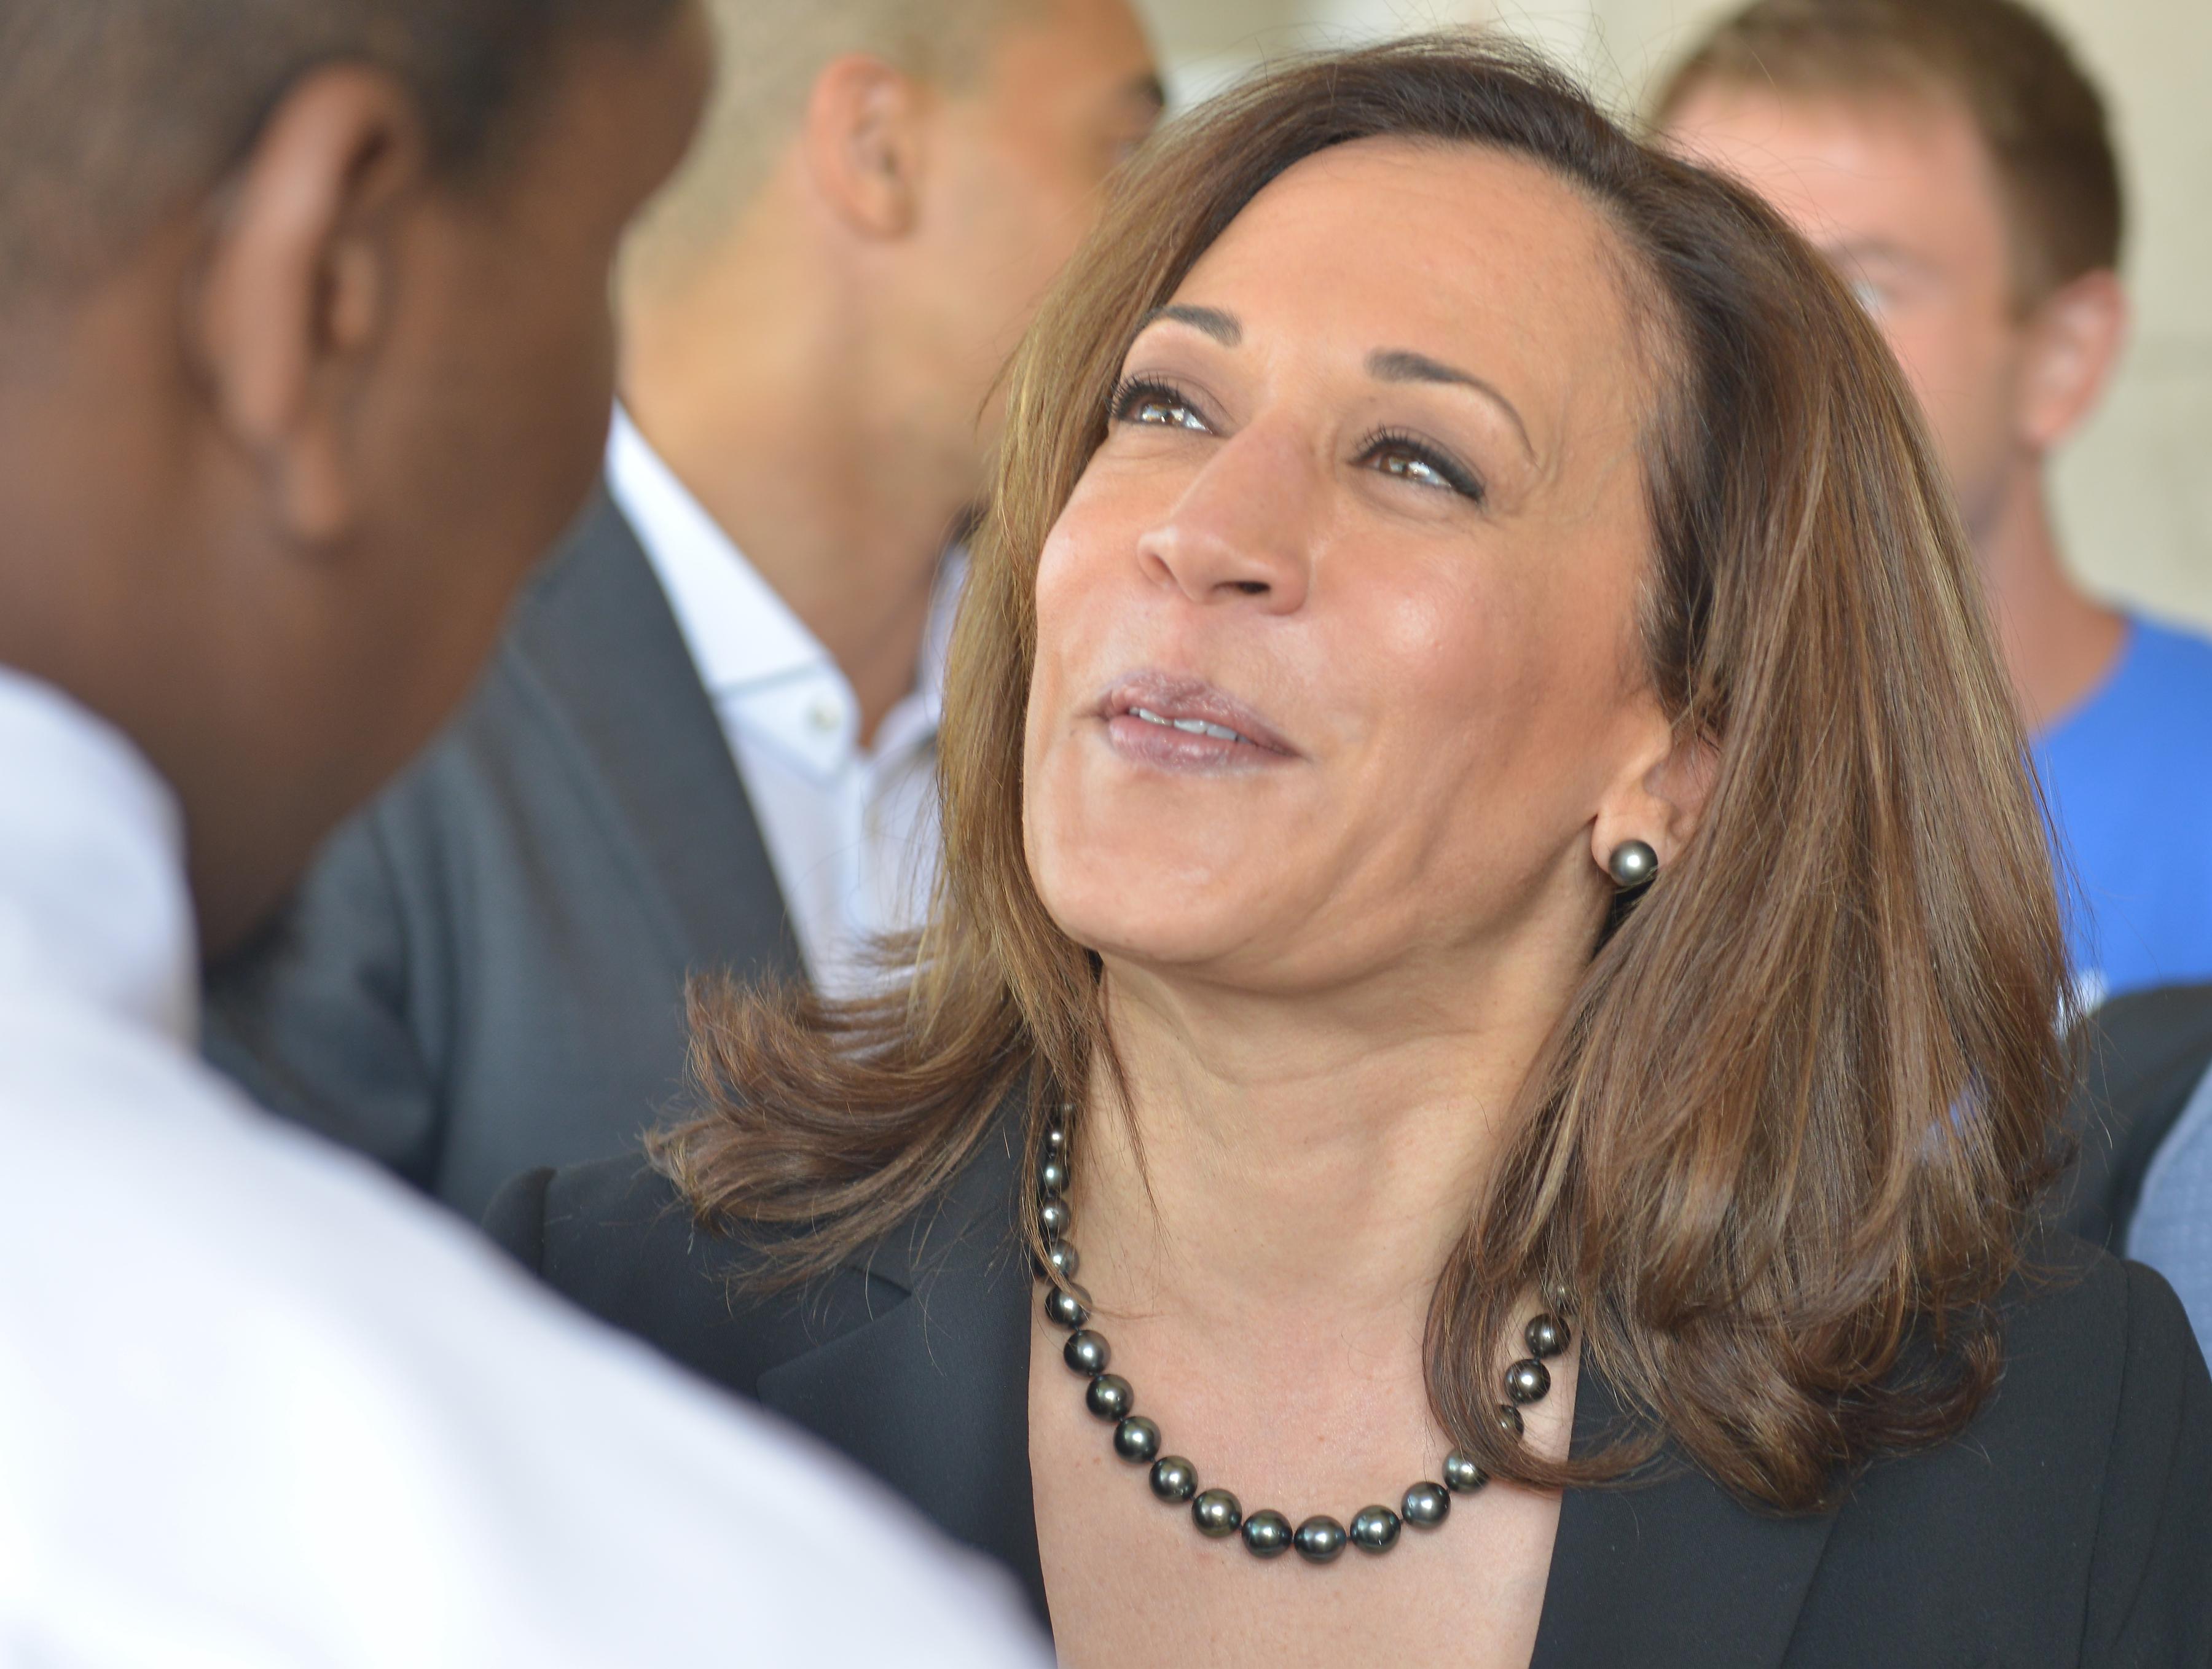 Mayor Andrew Gillum to Campaign with U.S. Sen. Kamala Harris